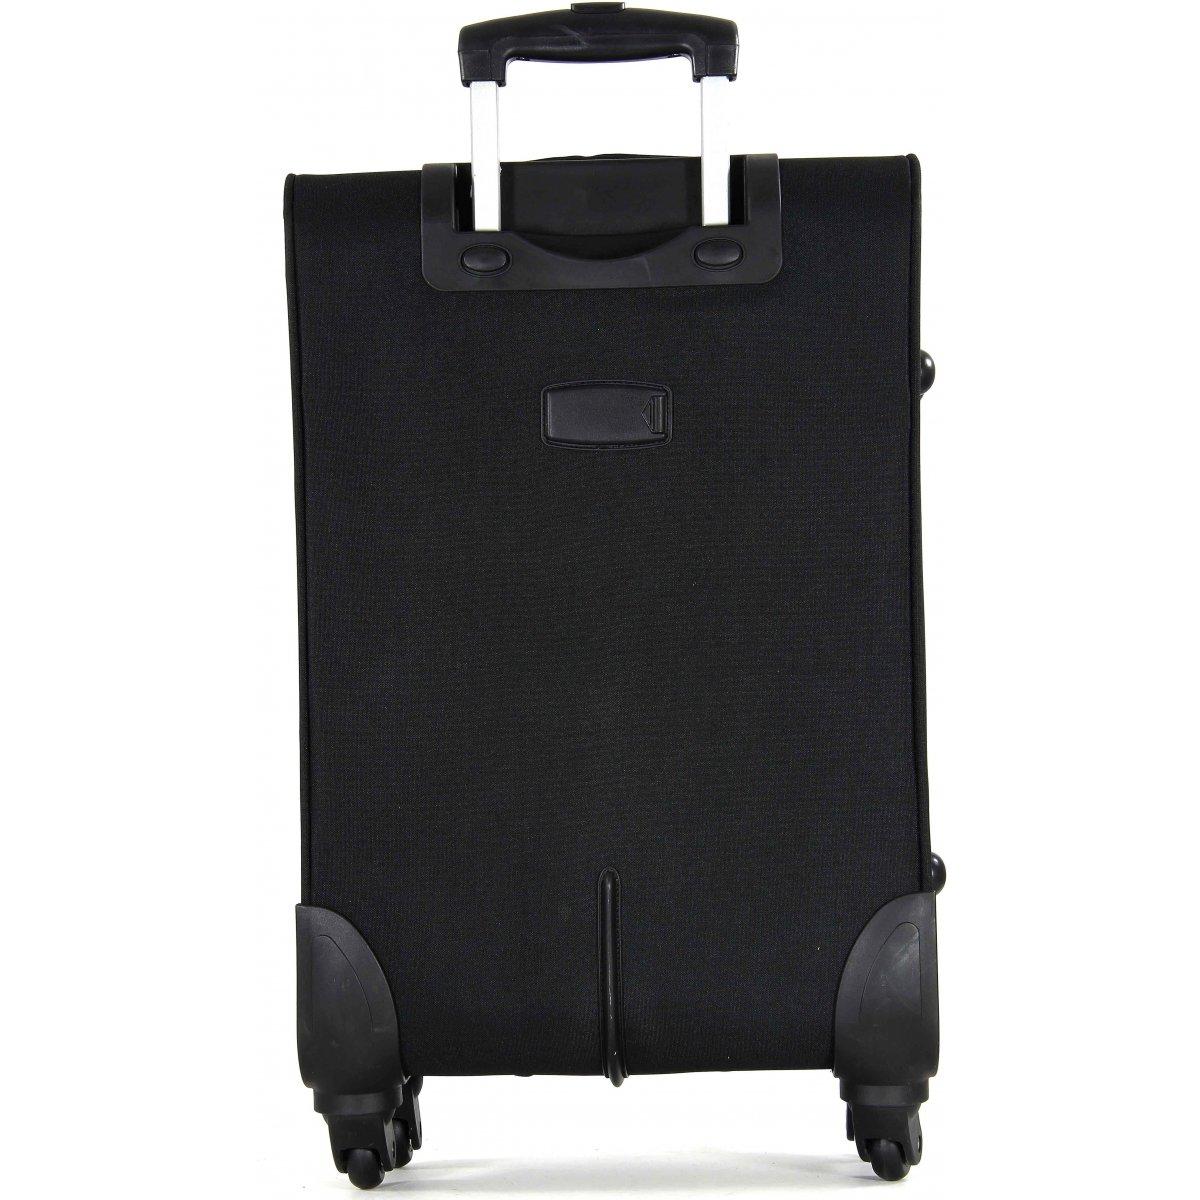 valise souple david jones 76cm r20031g couleur. Black Bedroom Furniture Sets. Home Design Ideas